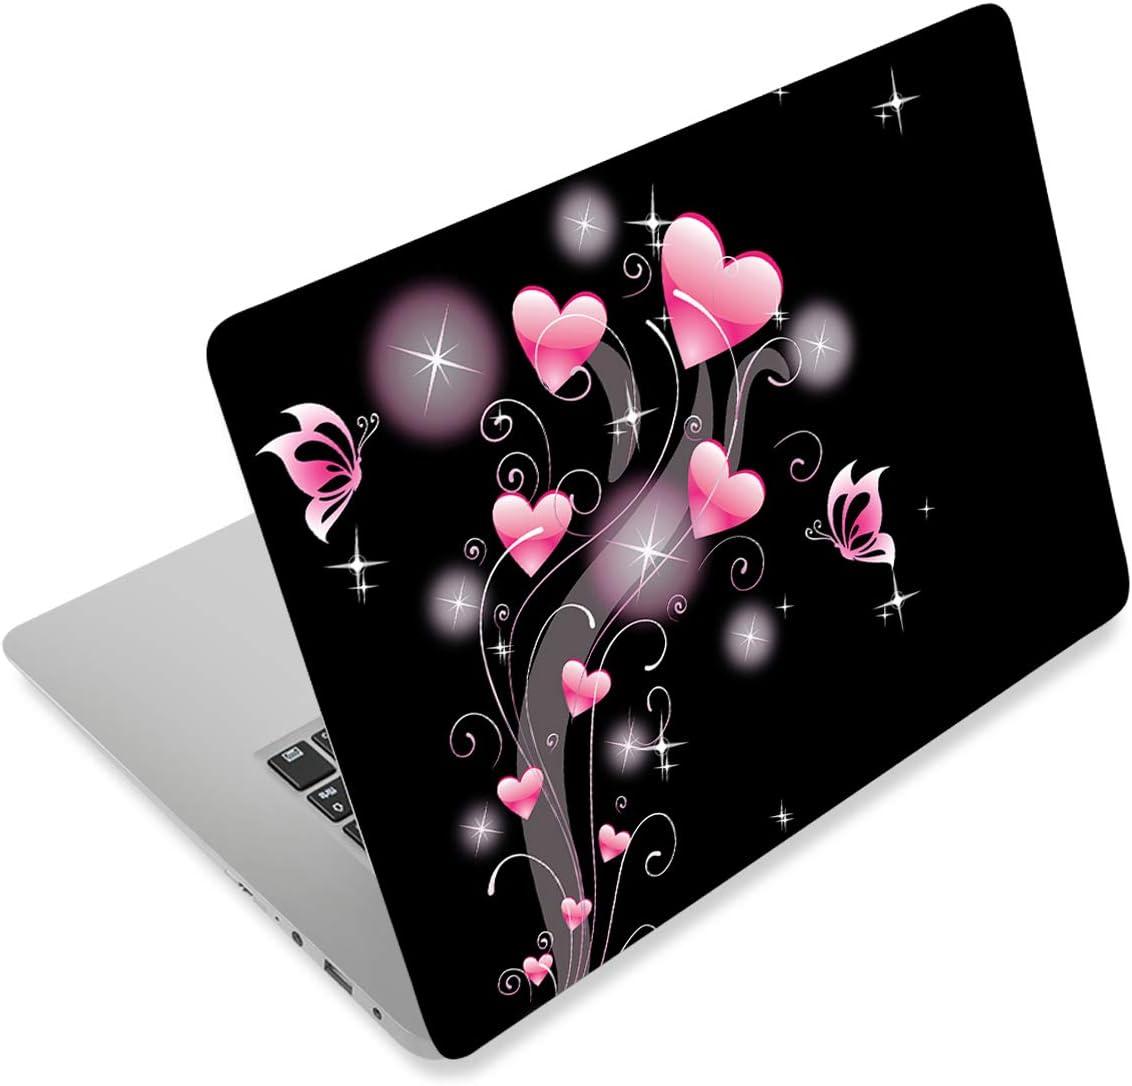 Laptop Skin Sticker Decal,12